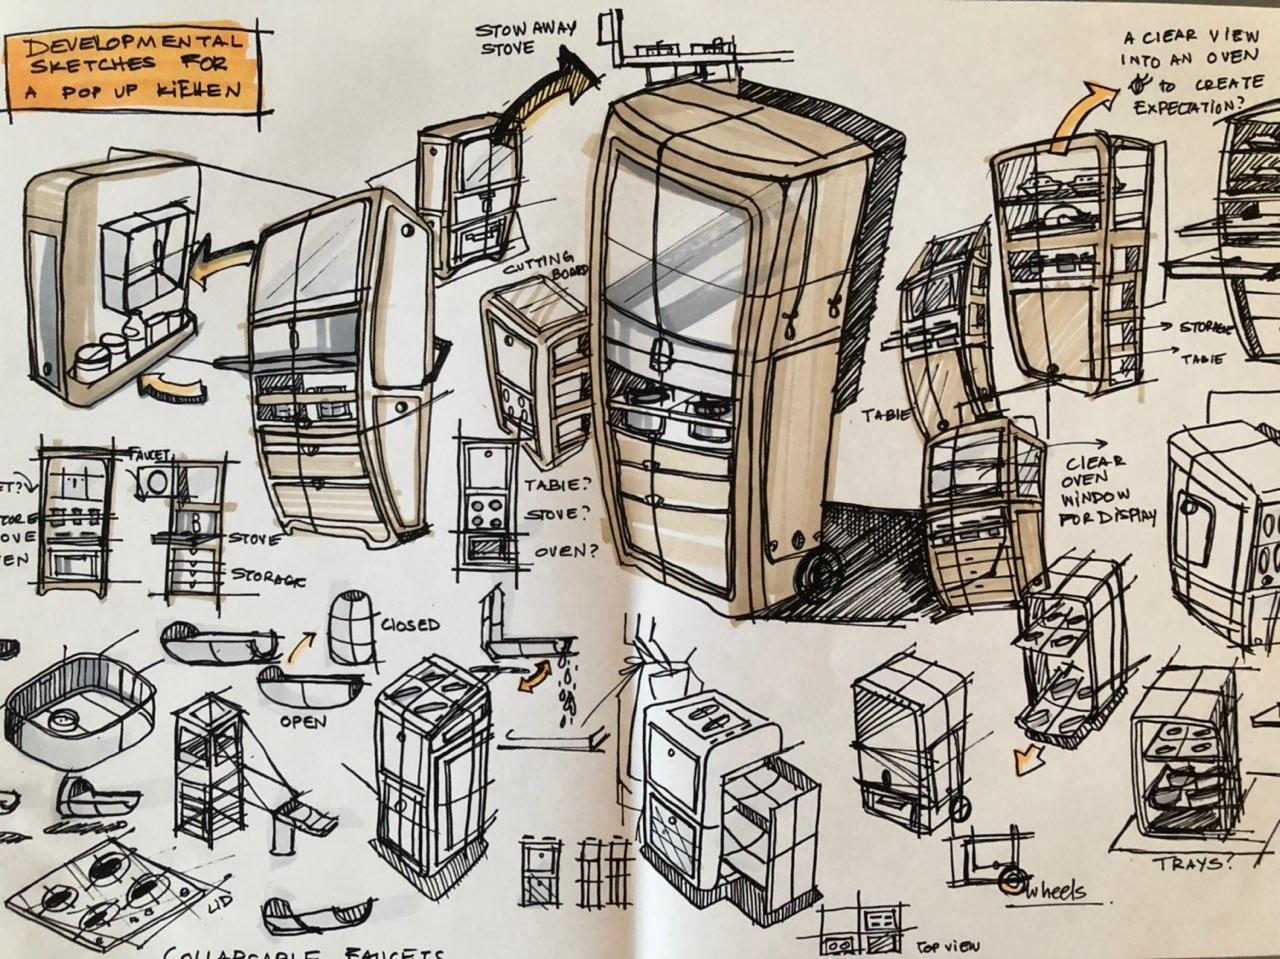 Developmental sketch: Pop up kicthen